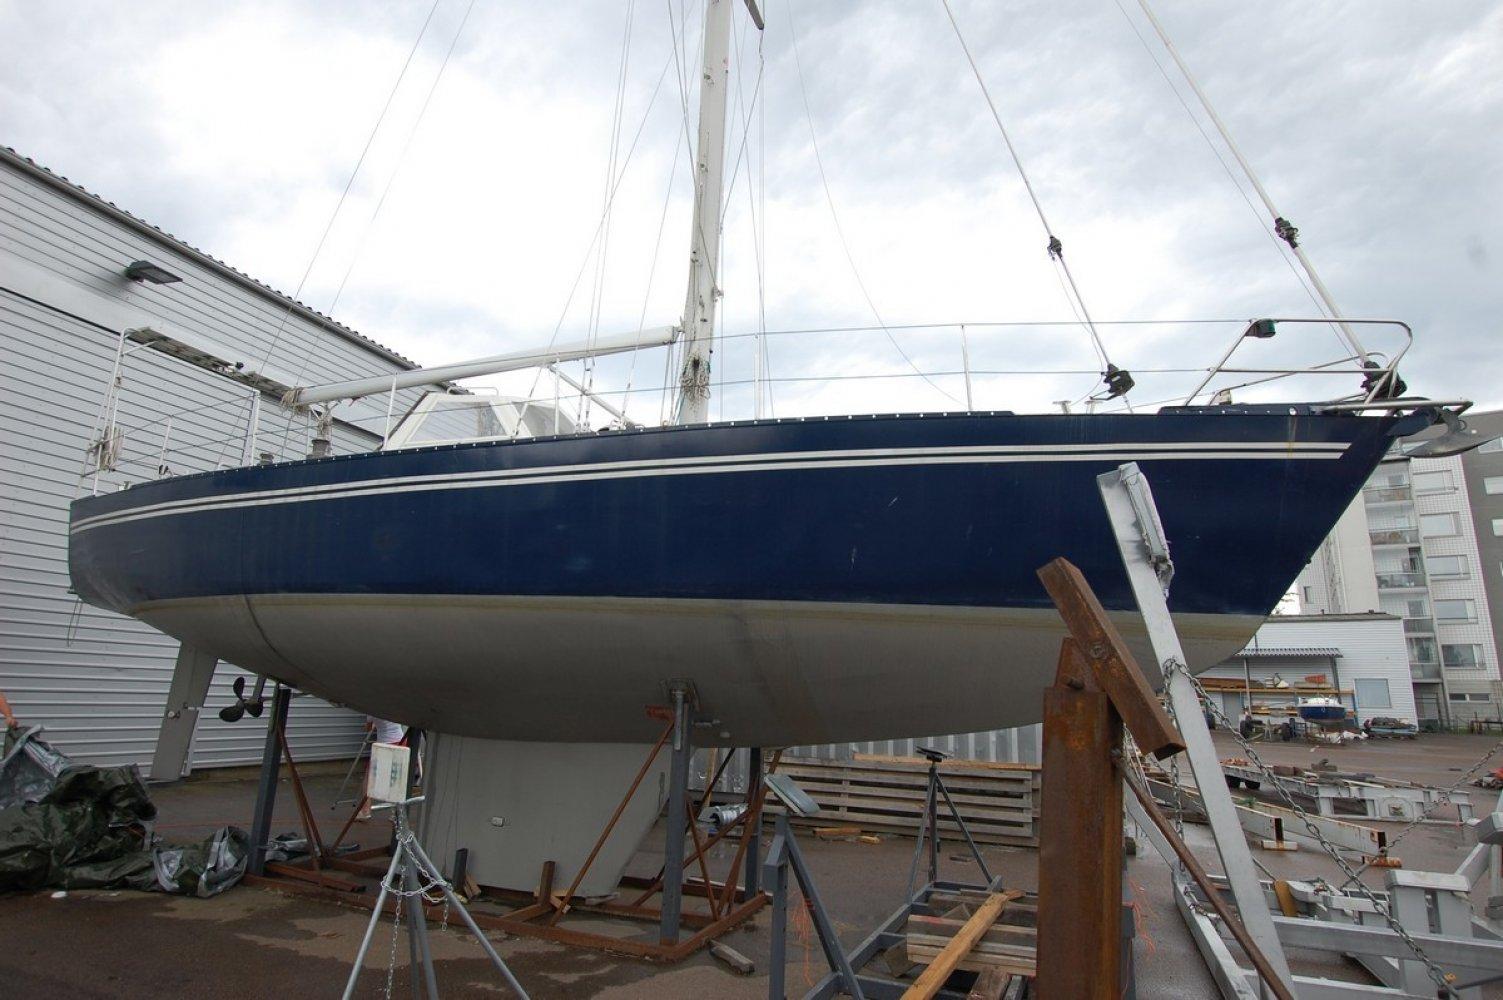 [Imagen: image.php?yacht=166484&bid=20&fileName=V...uality=100]